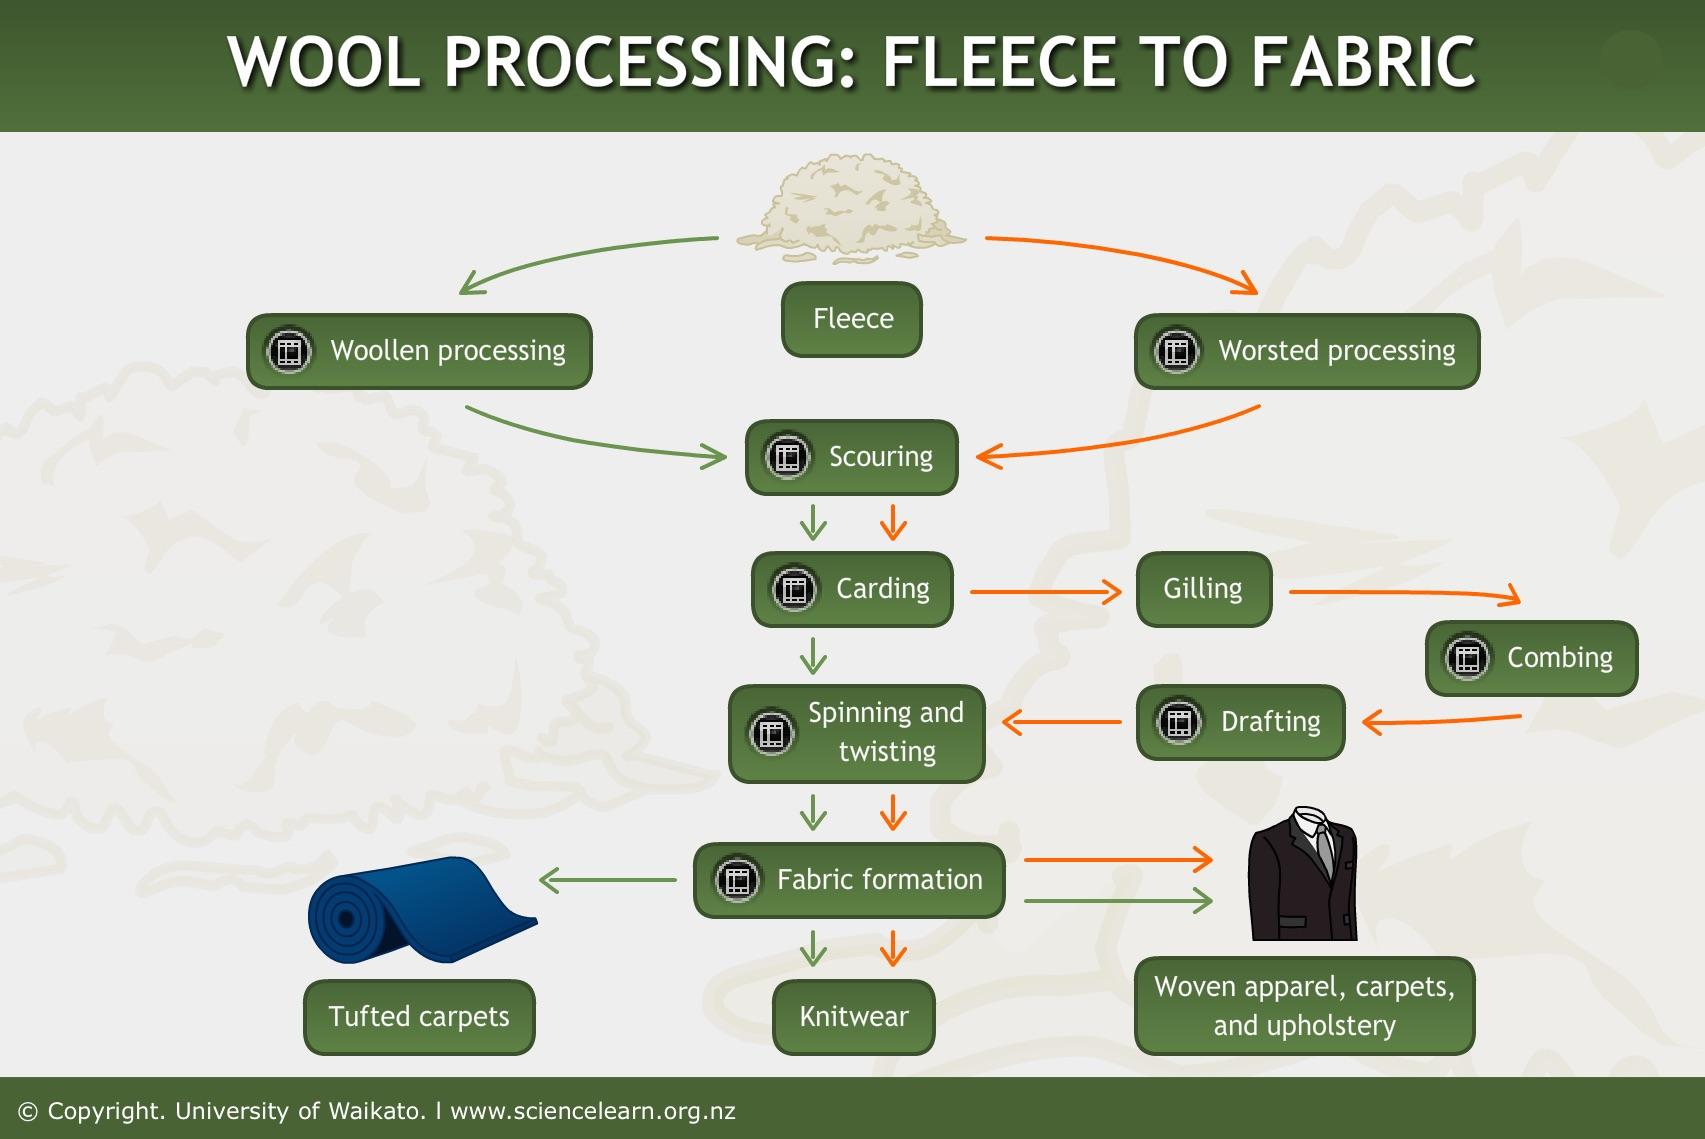 Wool processing: fleece to fabric